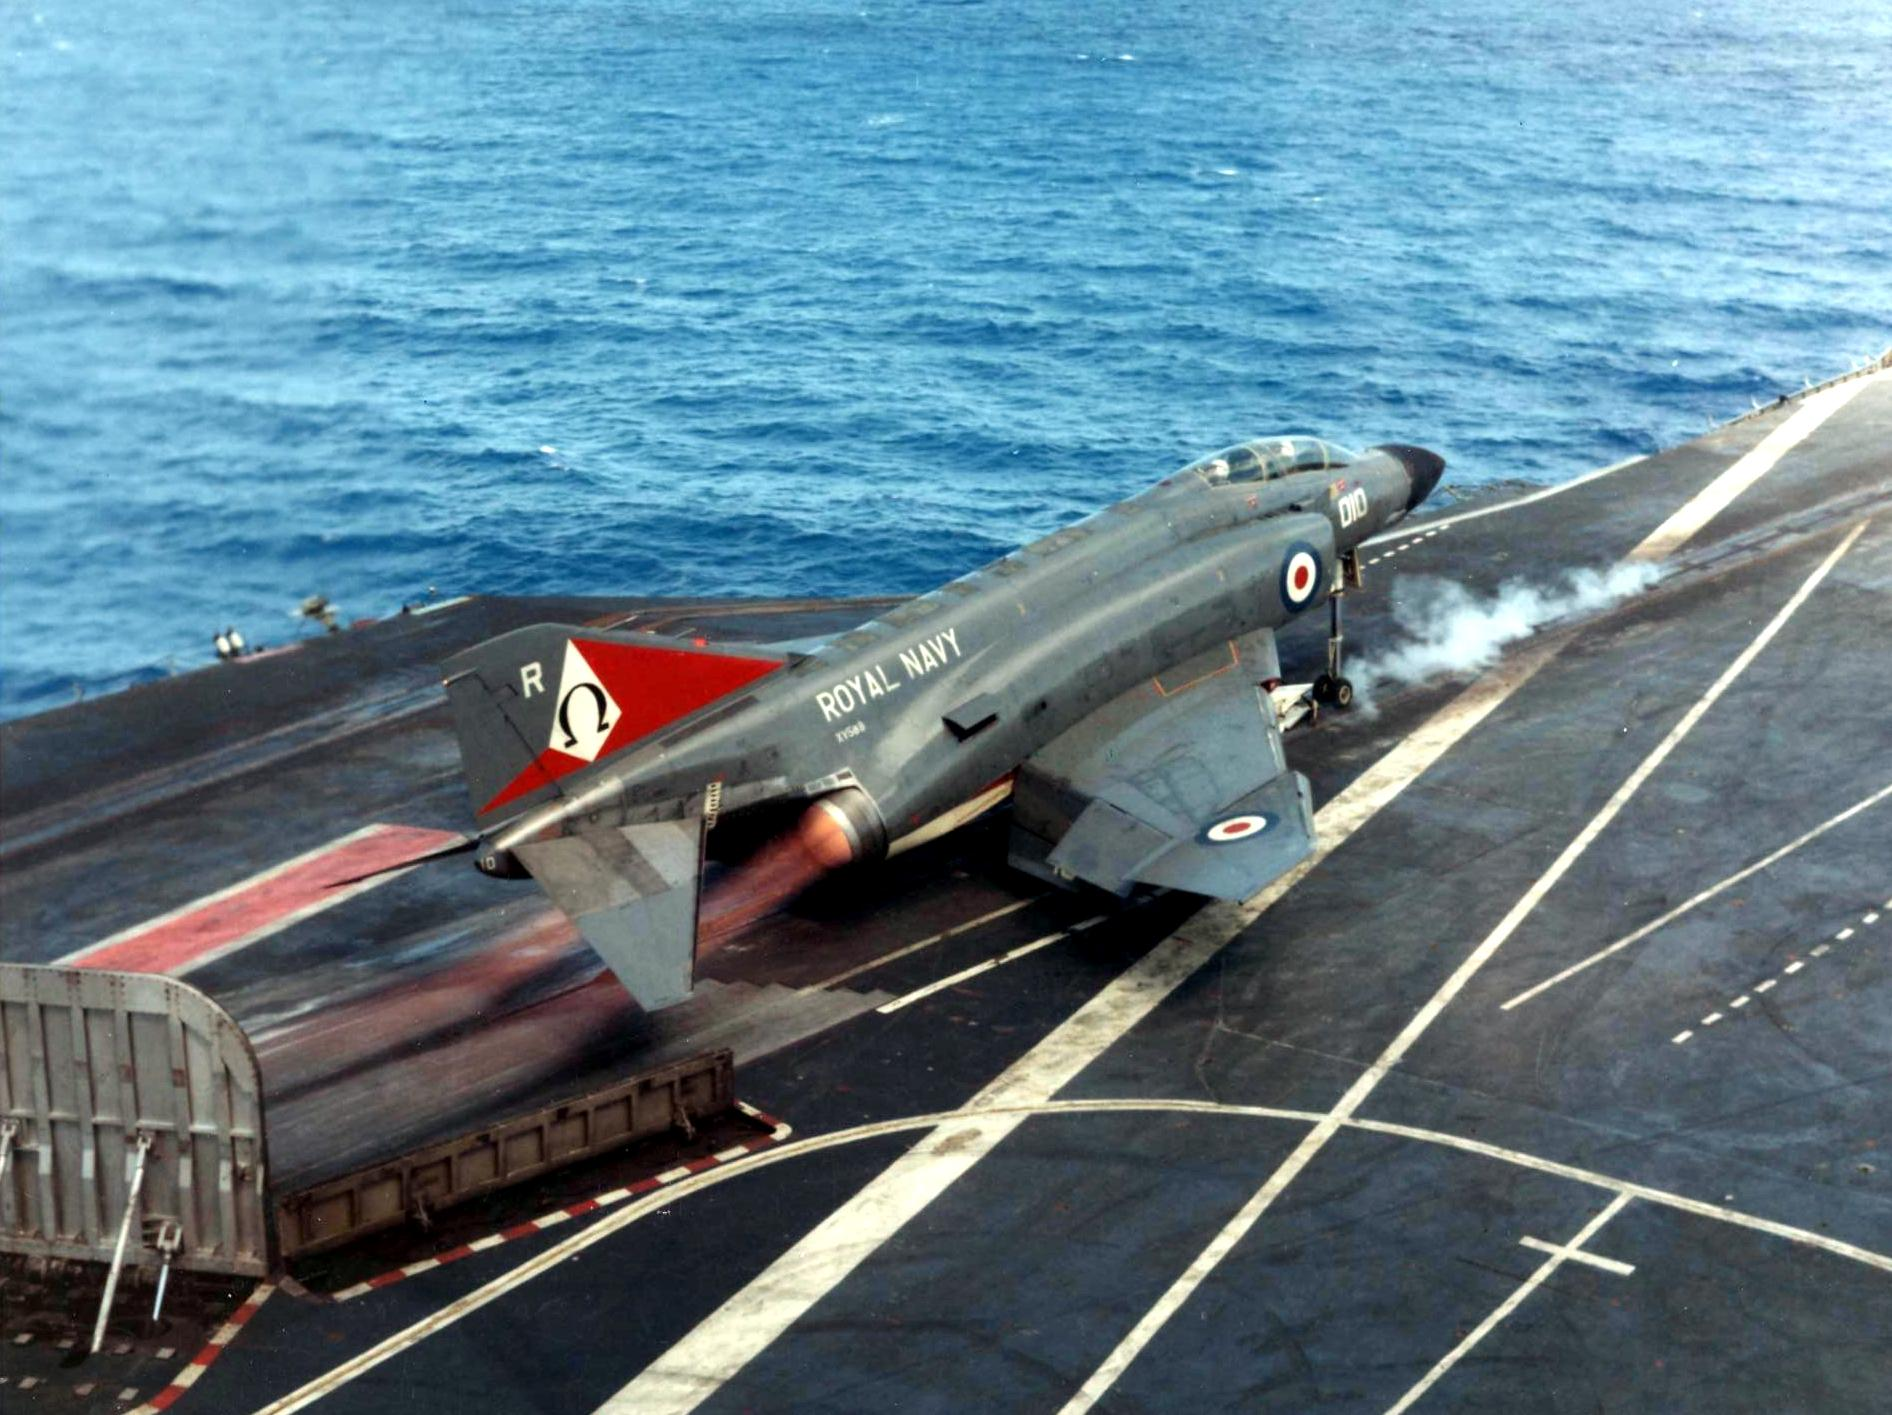 F4 Phantom Wallpaper F 4 Phantom Royal Navy 1050700 Hd